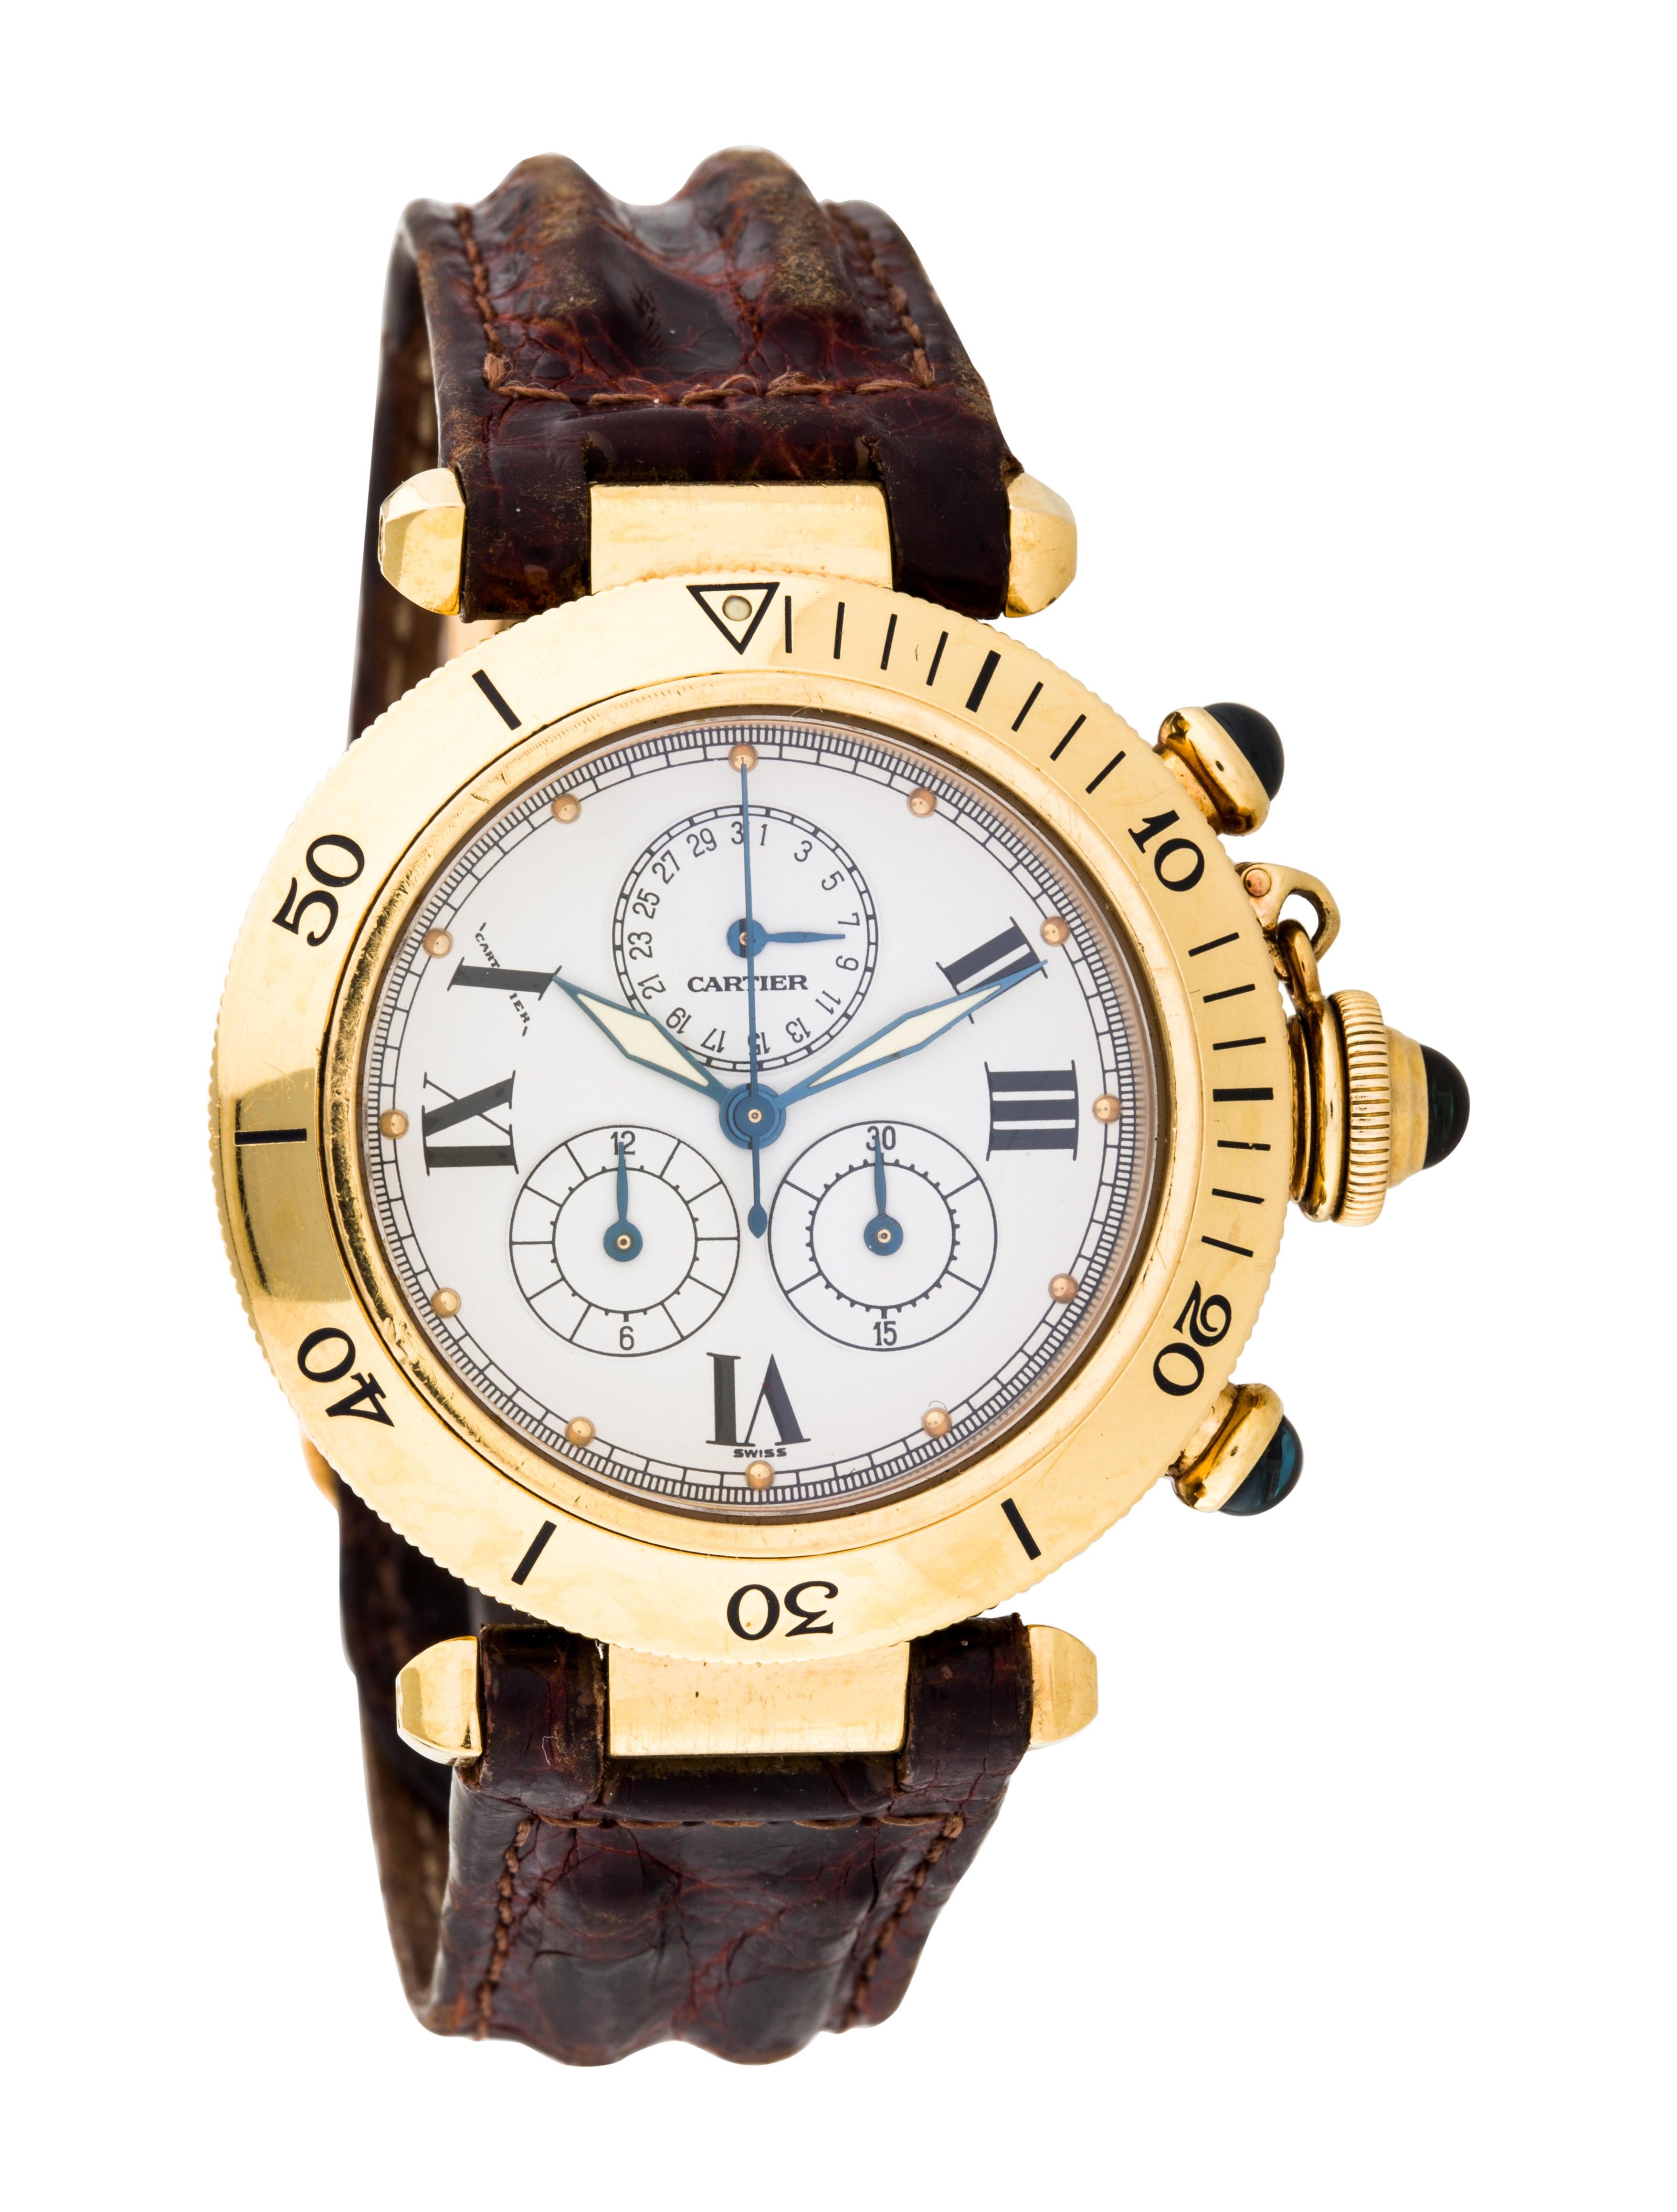 Cartier Pasha De Cartier Watch Strap Crt32213 The